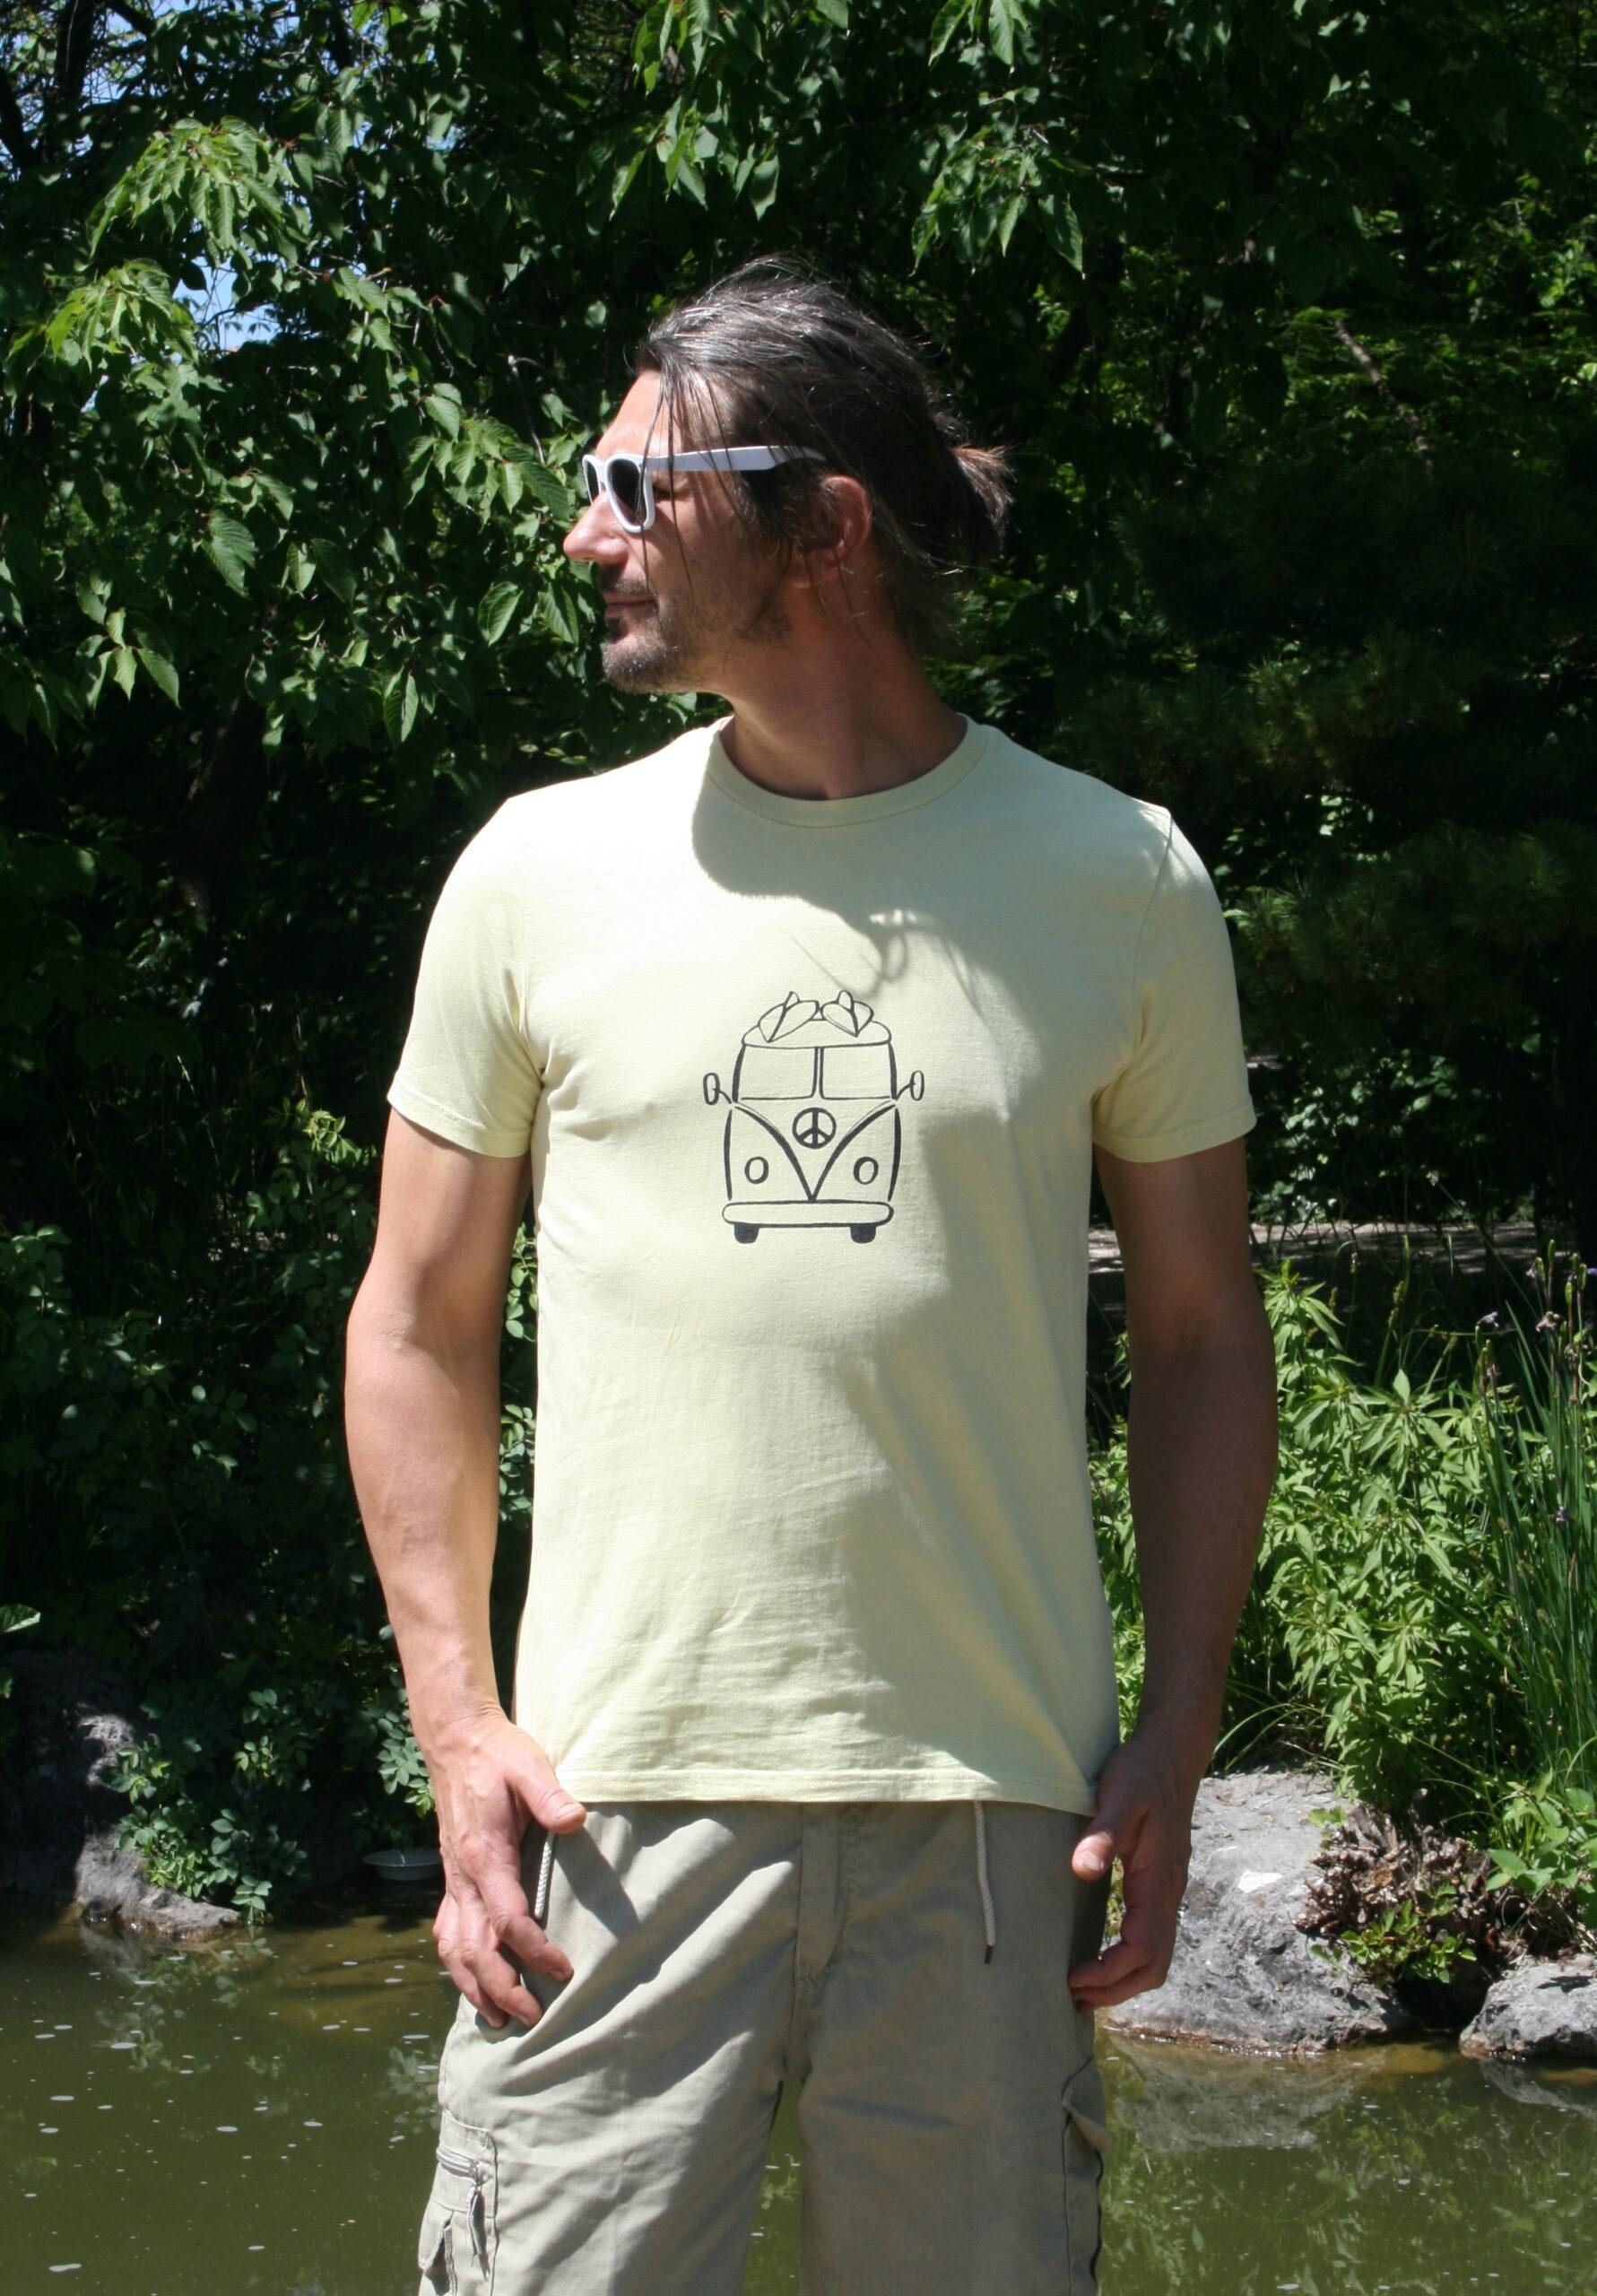 Hippiebus auf pale lemon shirt